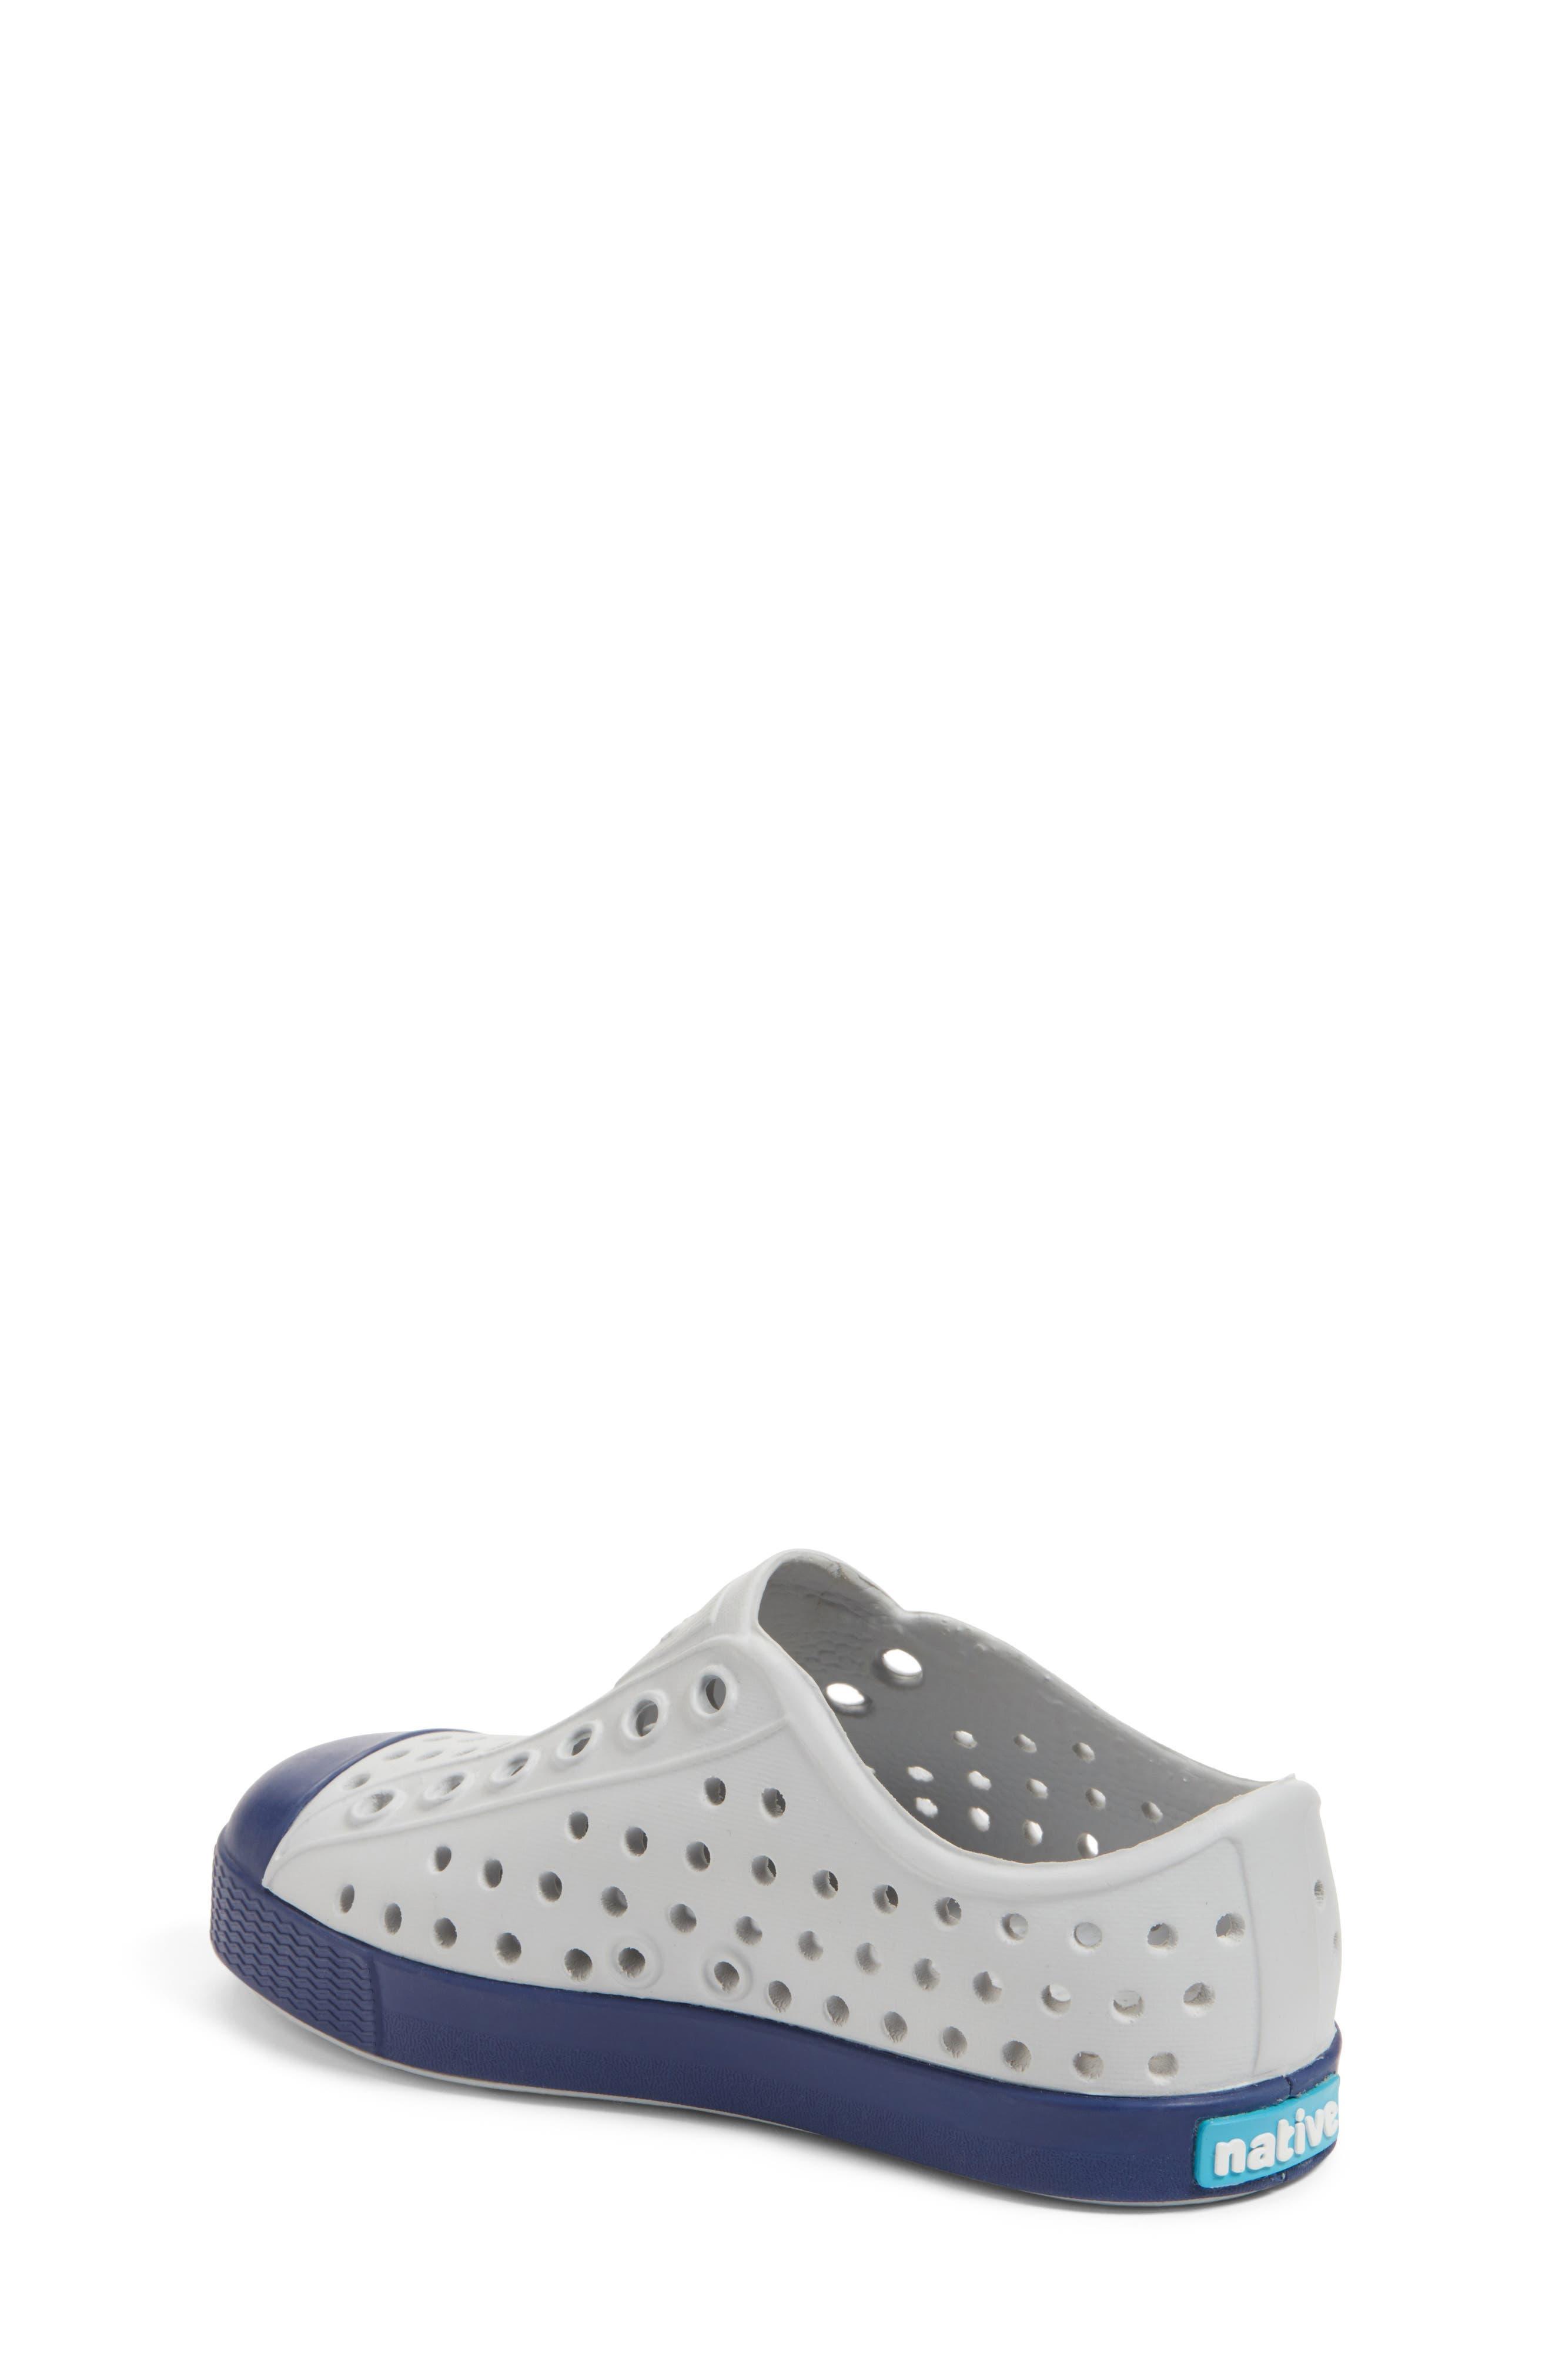 'Jefferson' Water Friendly Slip-On Sneaker,                             Alternate thumbnail 72, color,